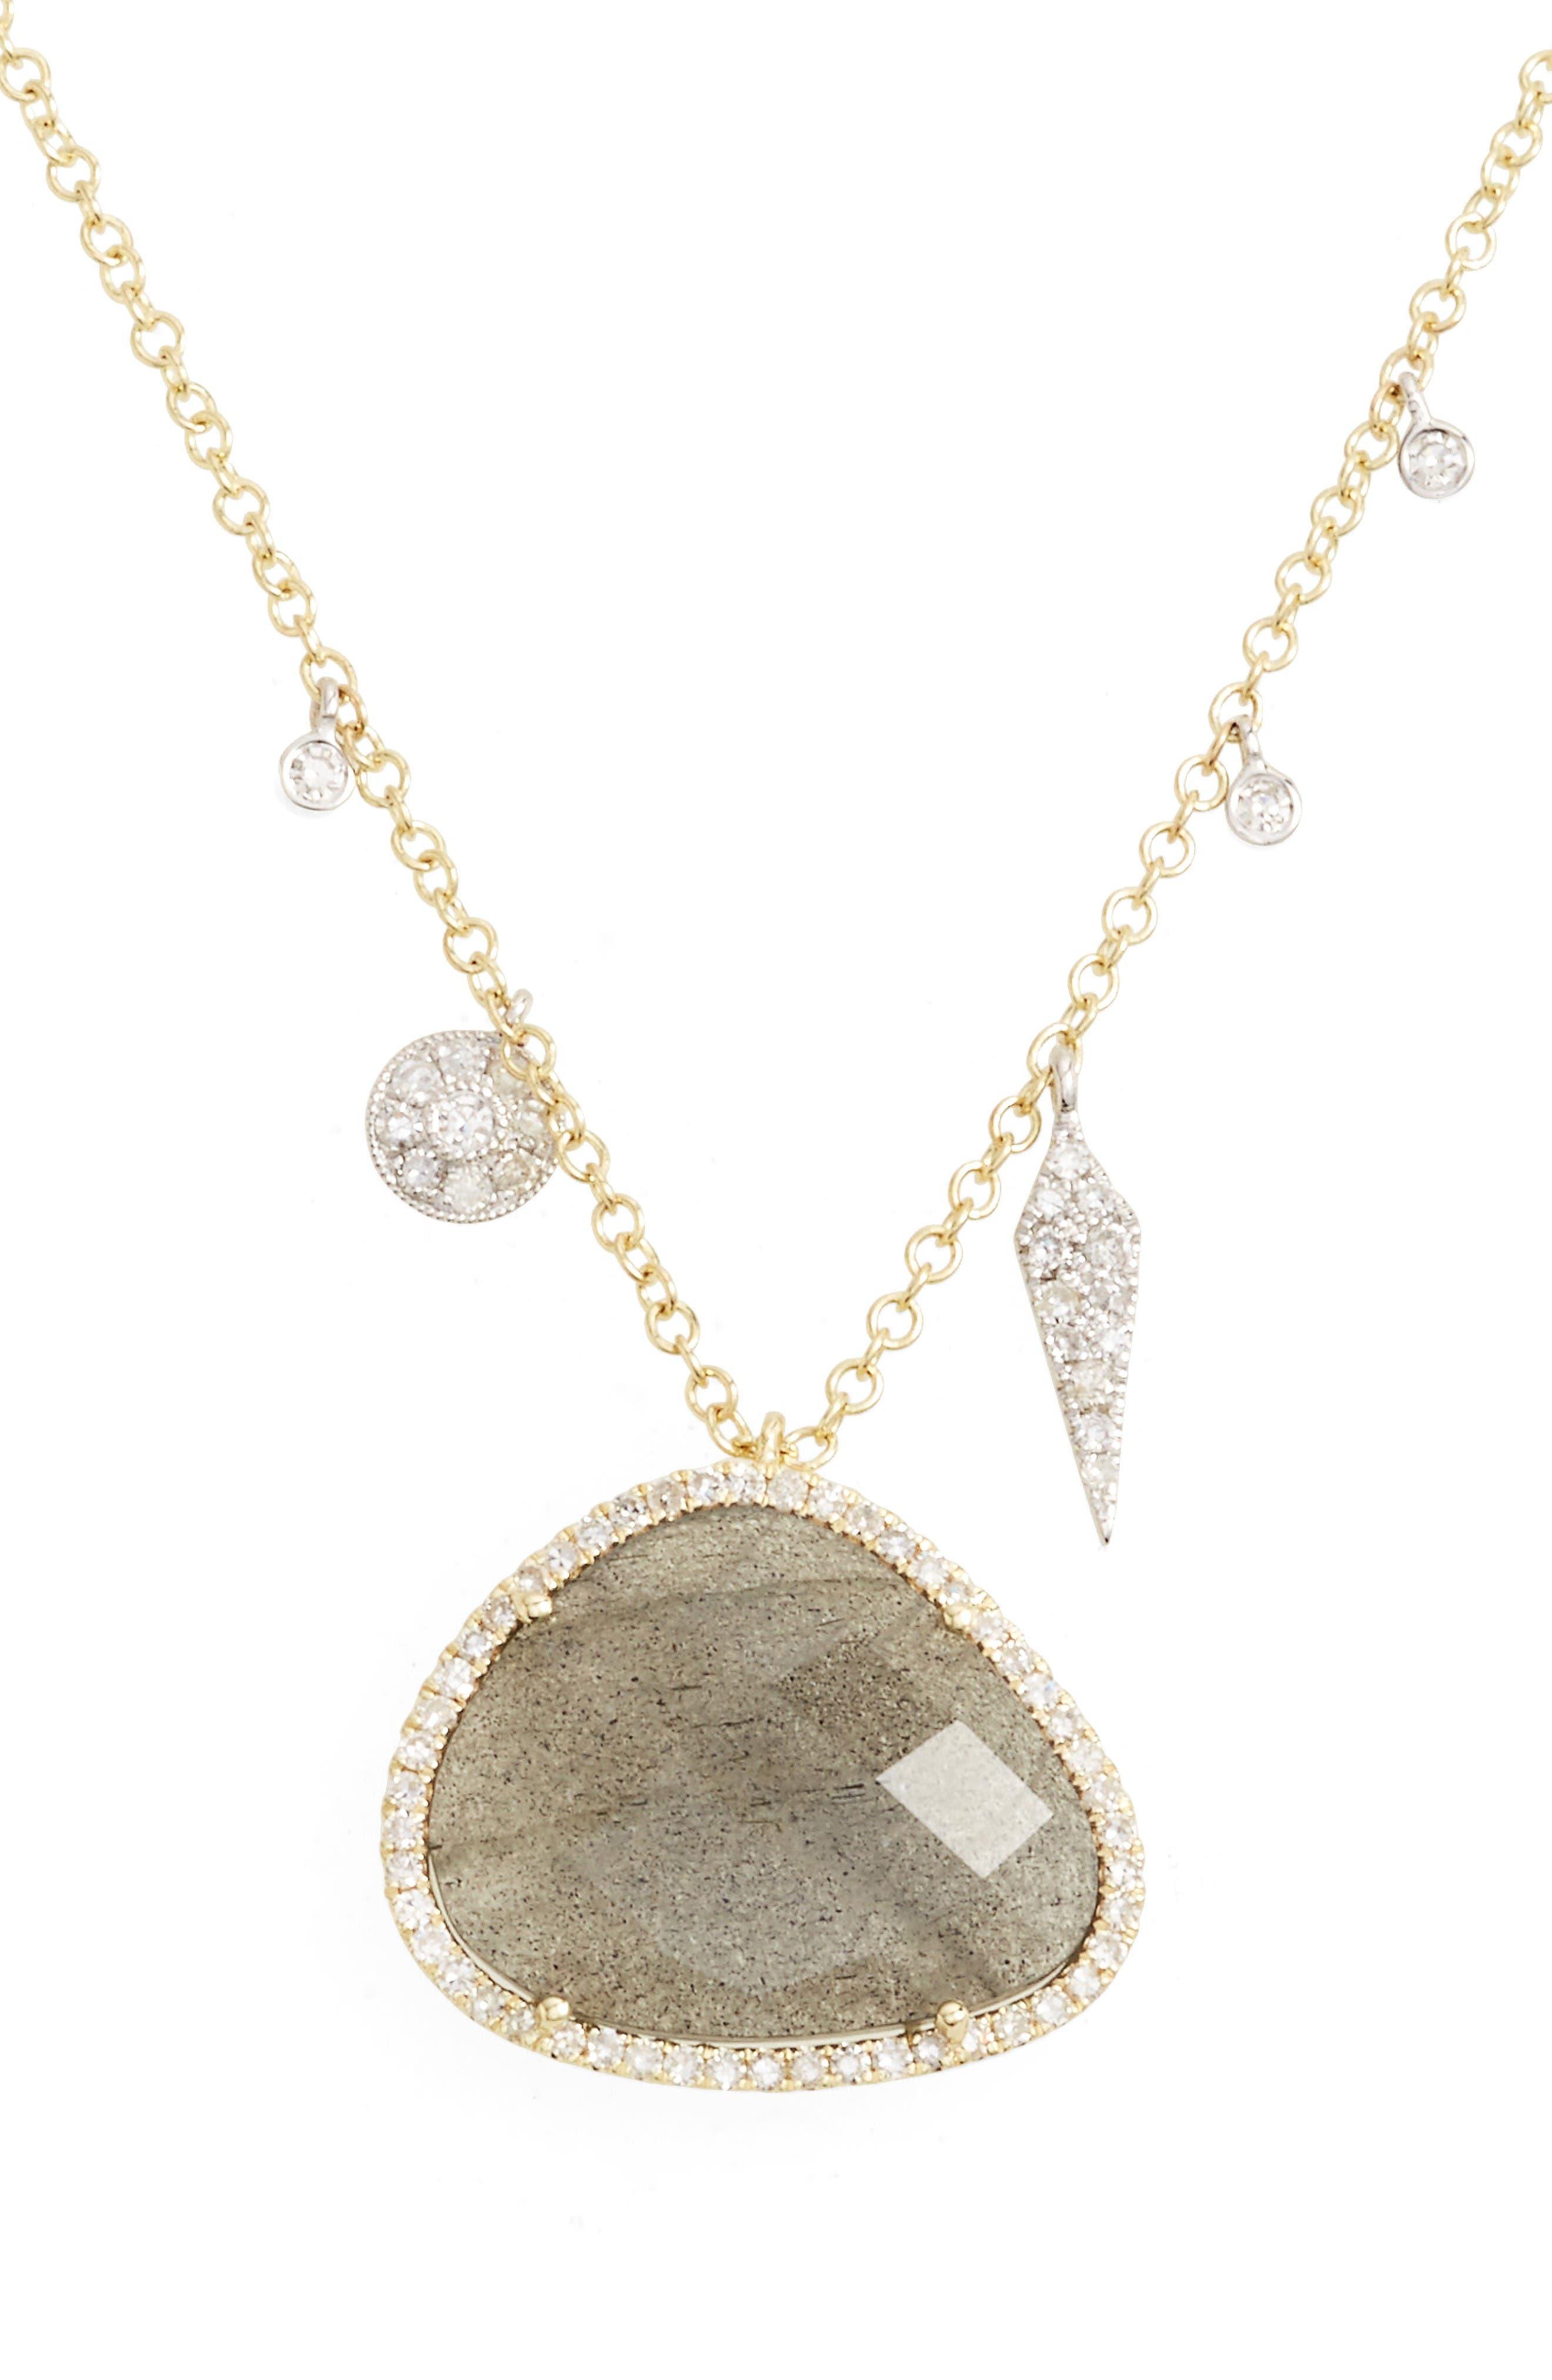 Jewelry Diamond & Semiprecious Stone Pendant Necklace,                         Main,                         color, Yellow Gold/ Labradorite